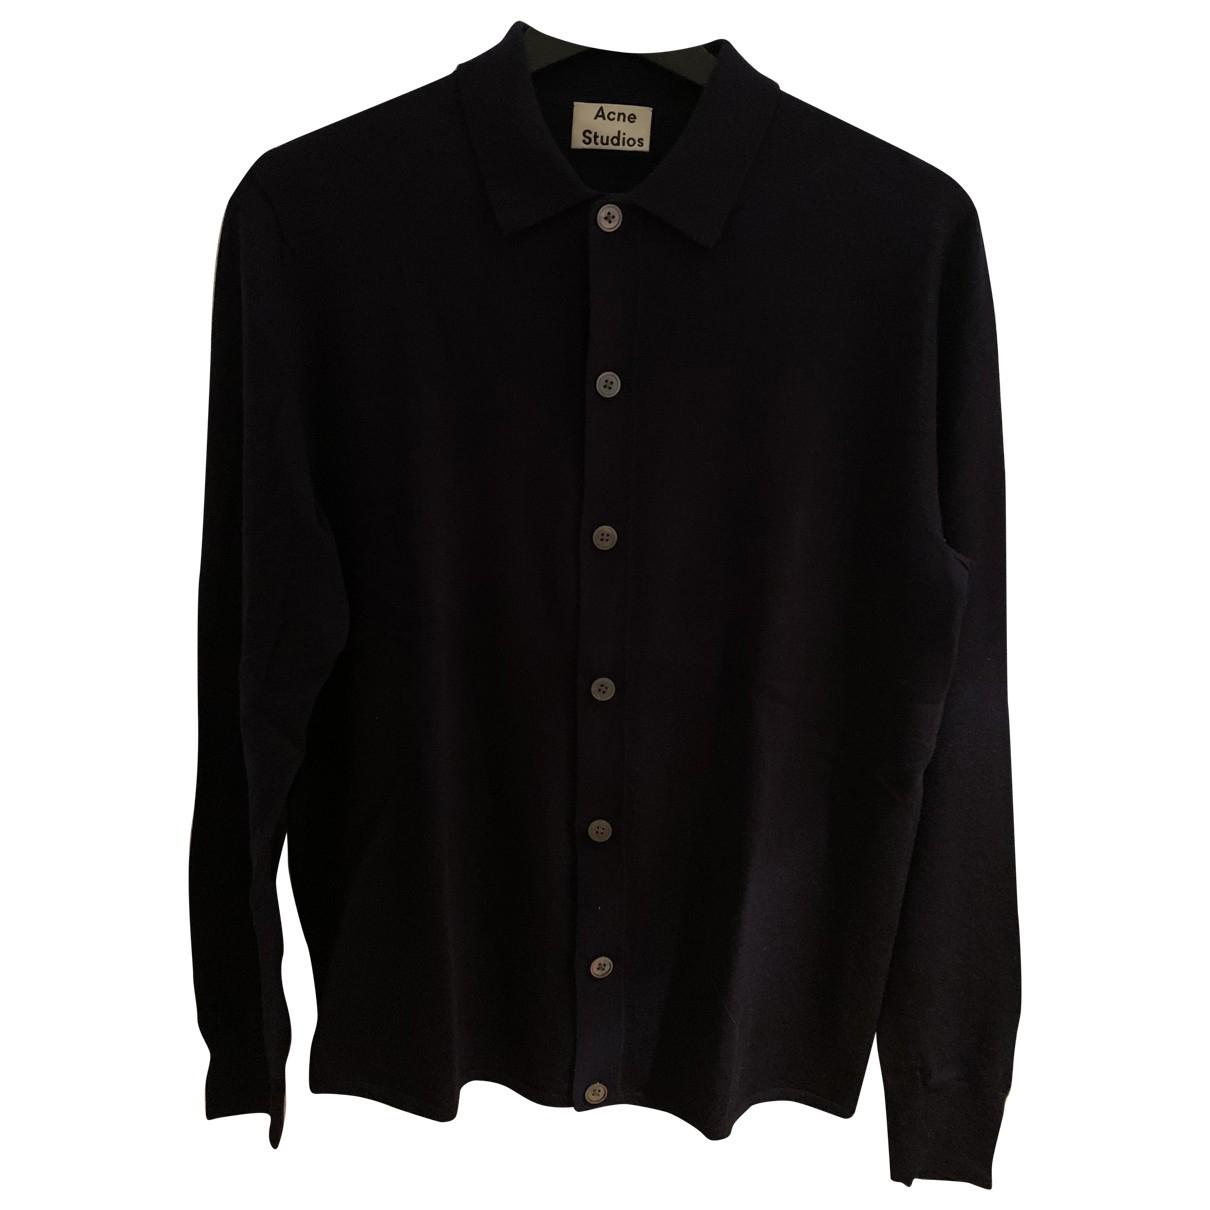 Acne Studios \N Black Wool Knitwear & Sweatshirts for Men S International